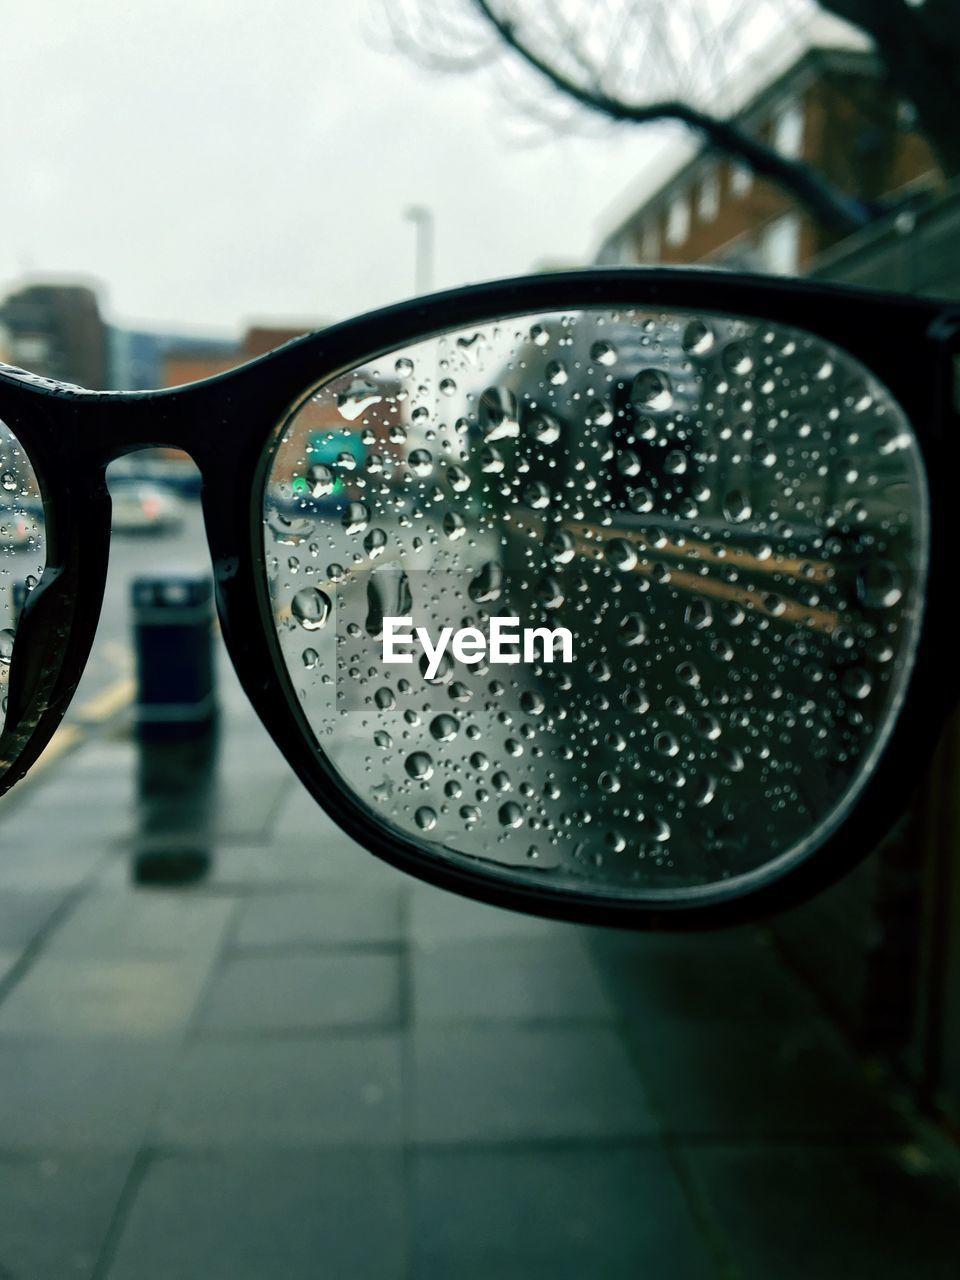 Close-up of raindrops on eyeglasses